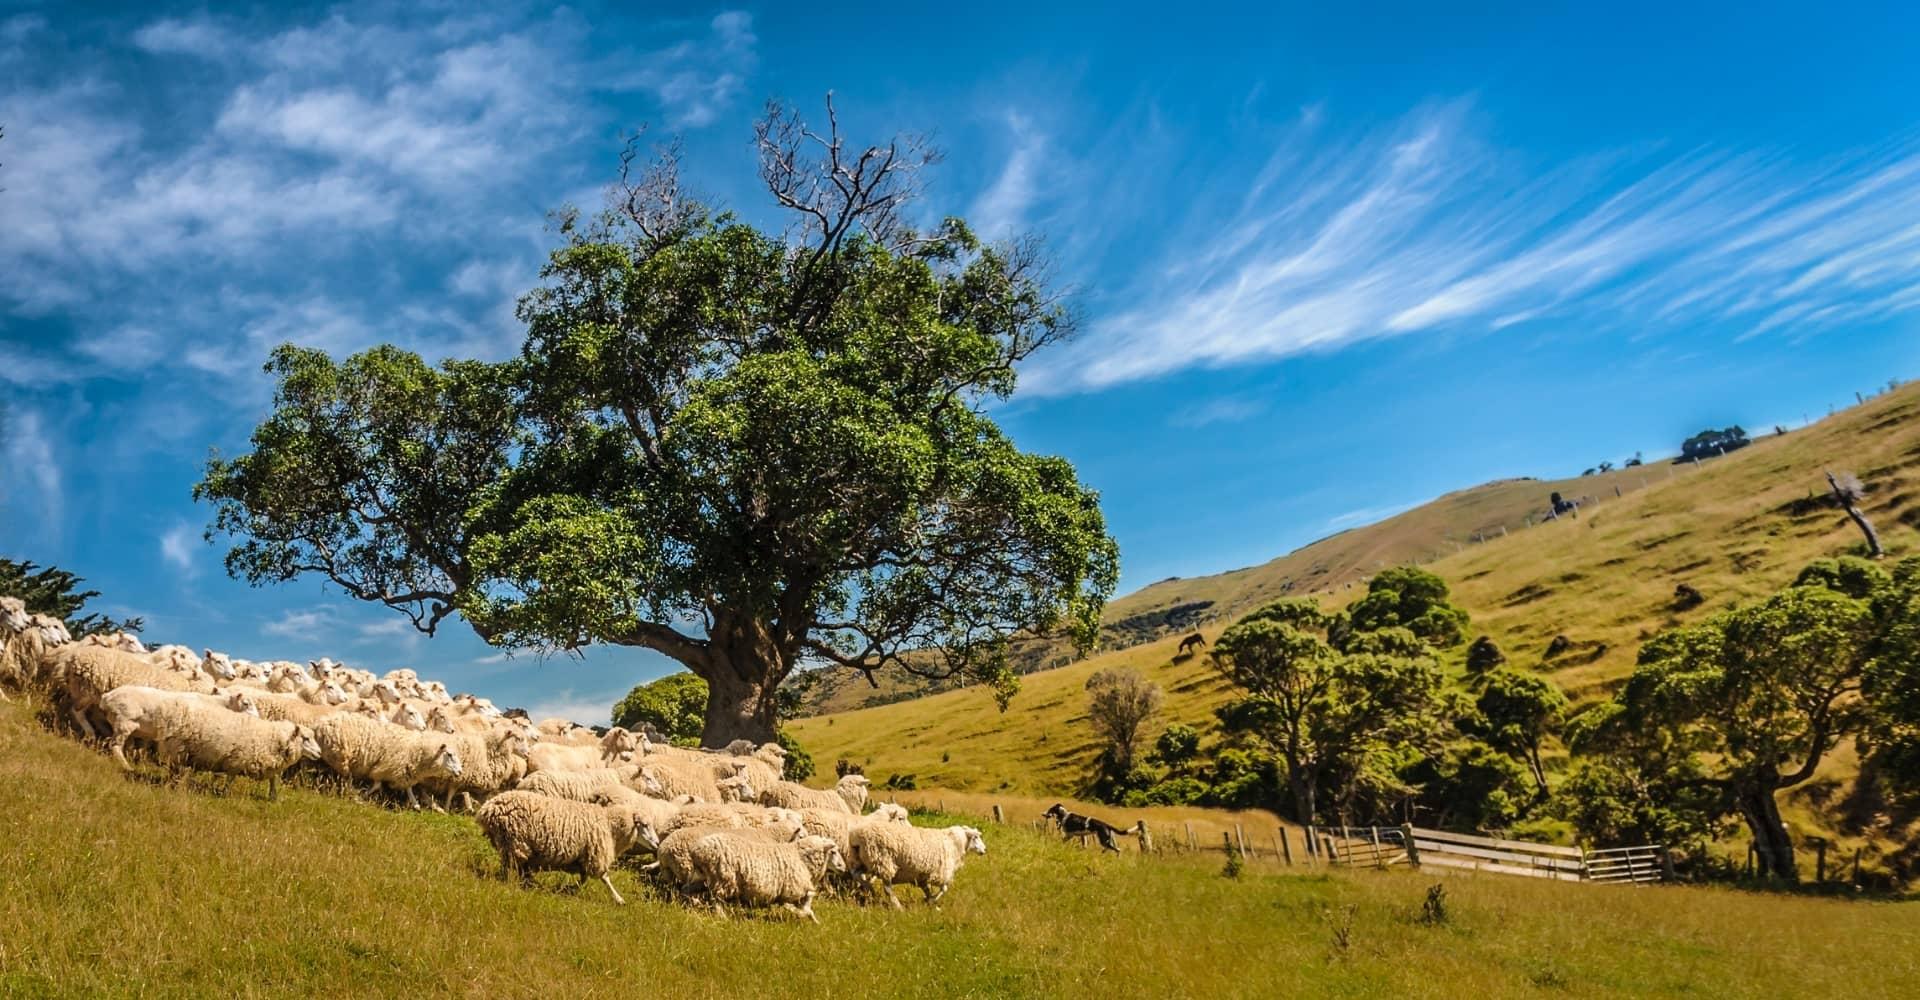 The Shepherd in The Tree Terry Neudorf